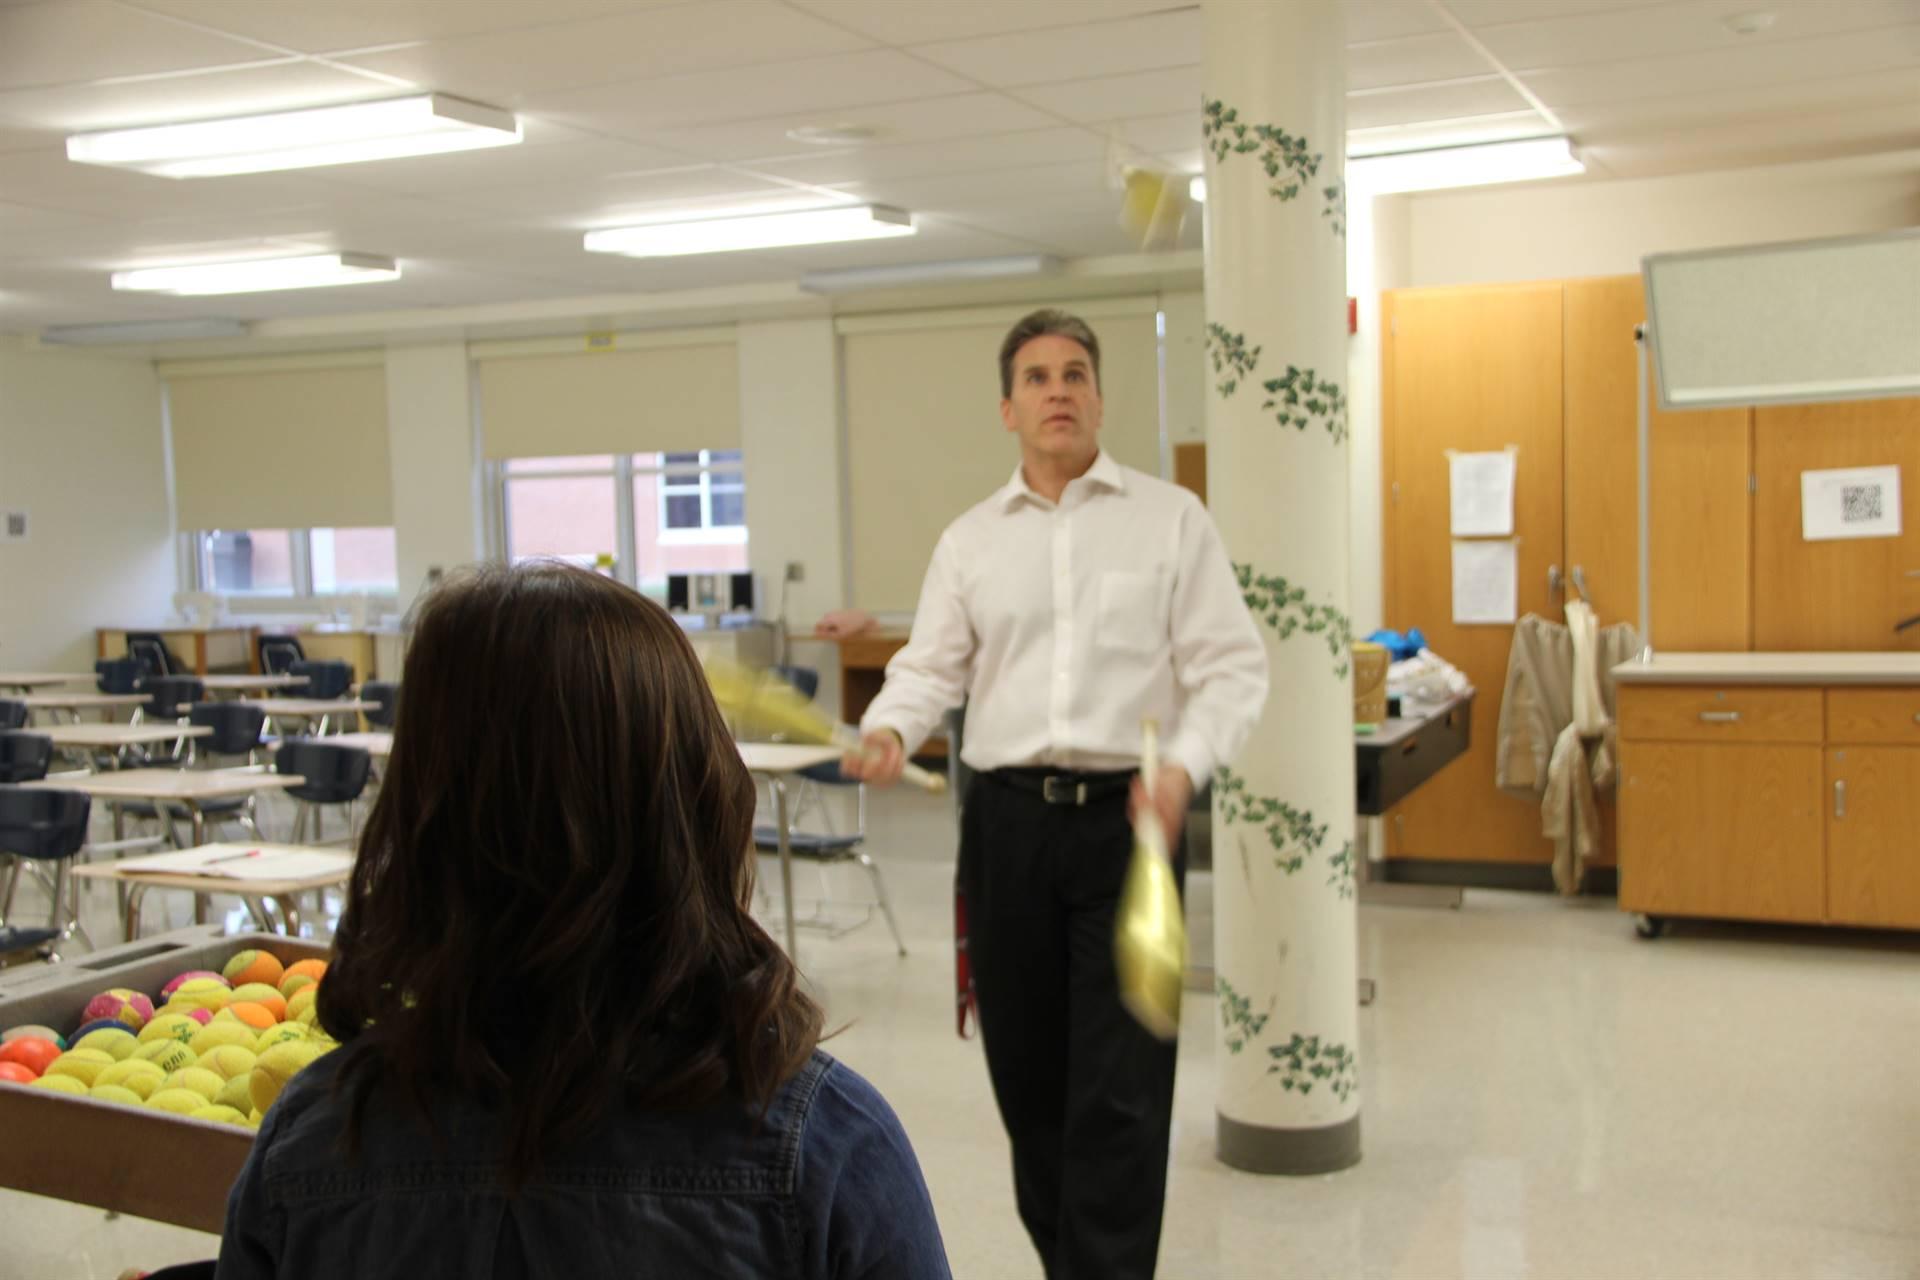 student watching teacher juggle